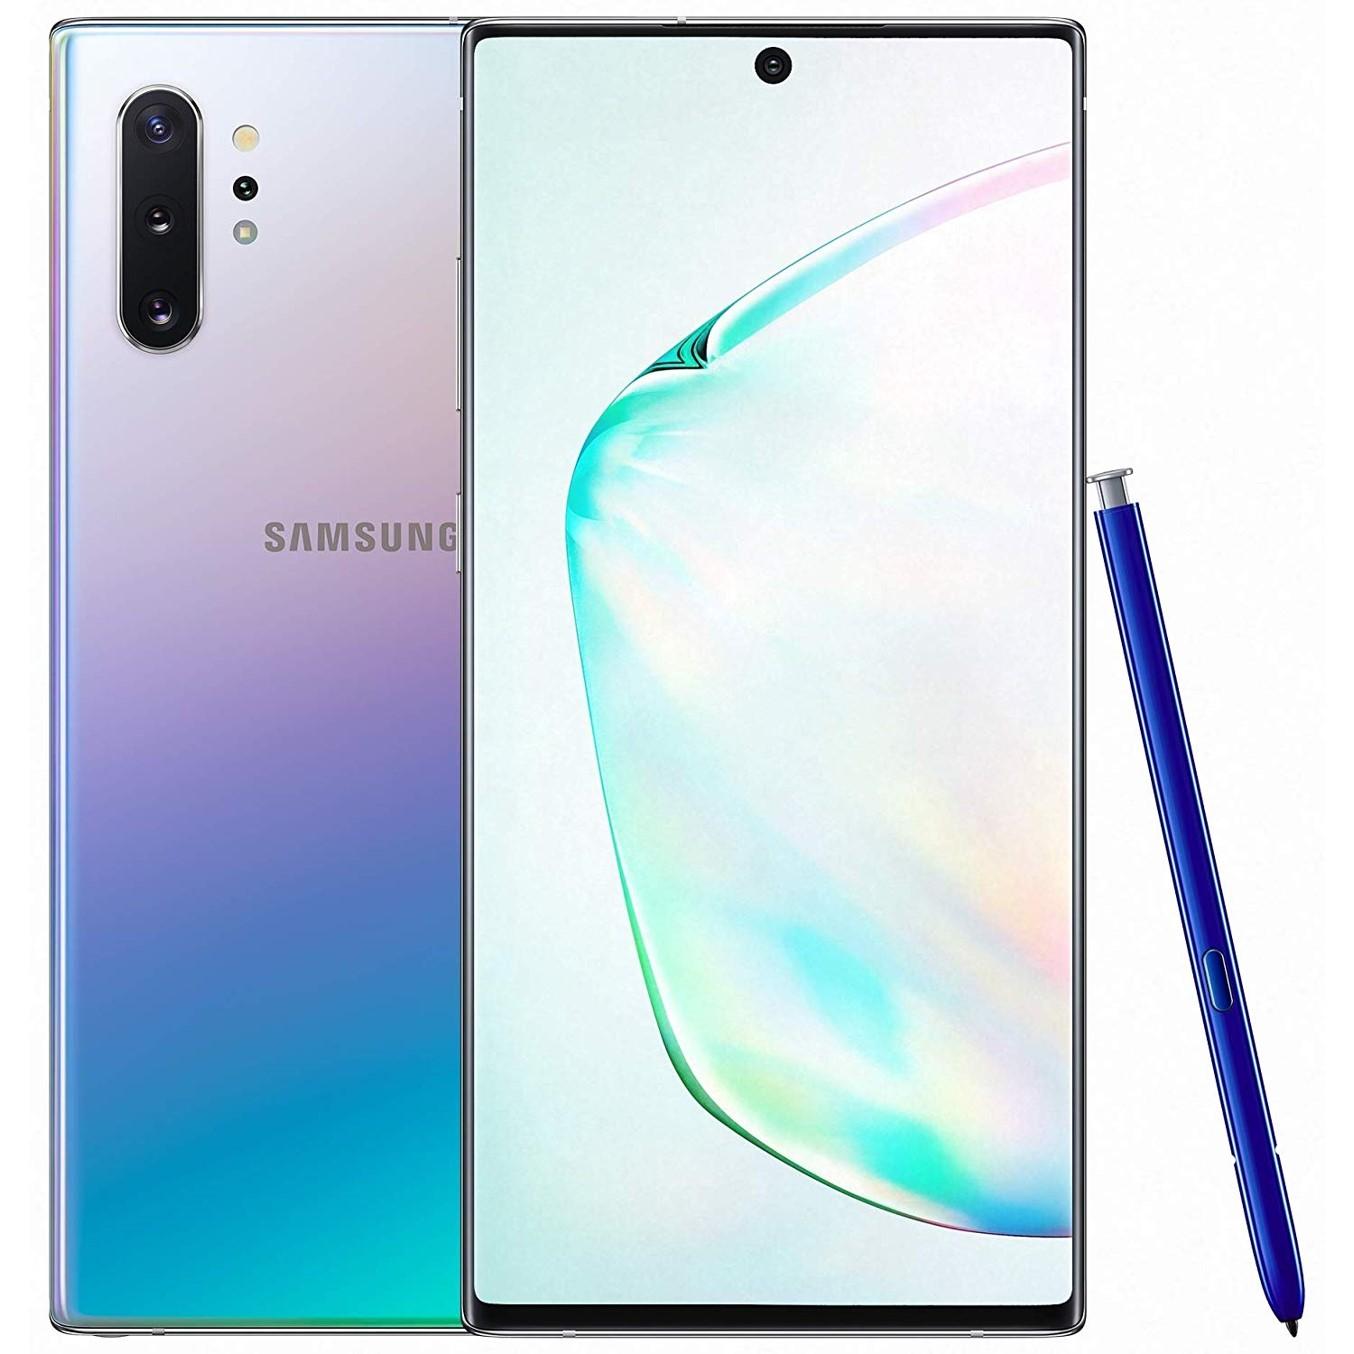 Telefono movil smartphone samsung galaxy note 10 aura glow - 6.3pulgadas - 256gb ram - 8gb ram - 12 + 16 + 12 mpx -  10mpx - octa core - dual sim - lector de huella